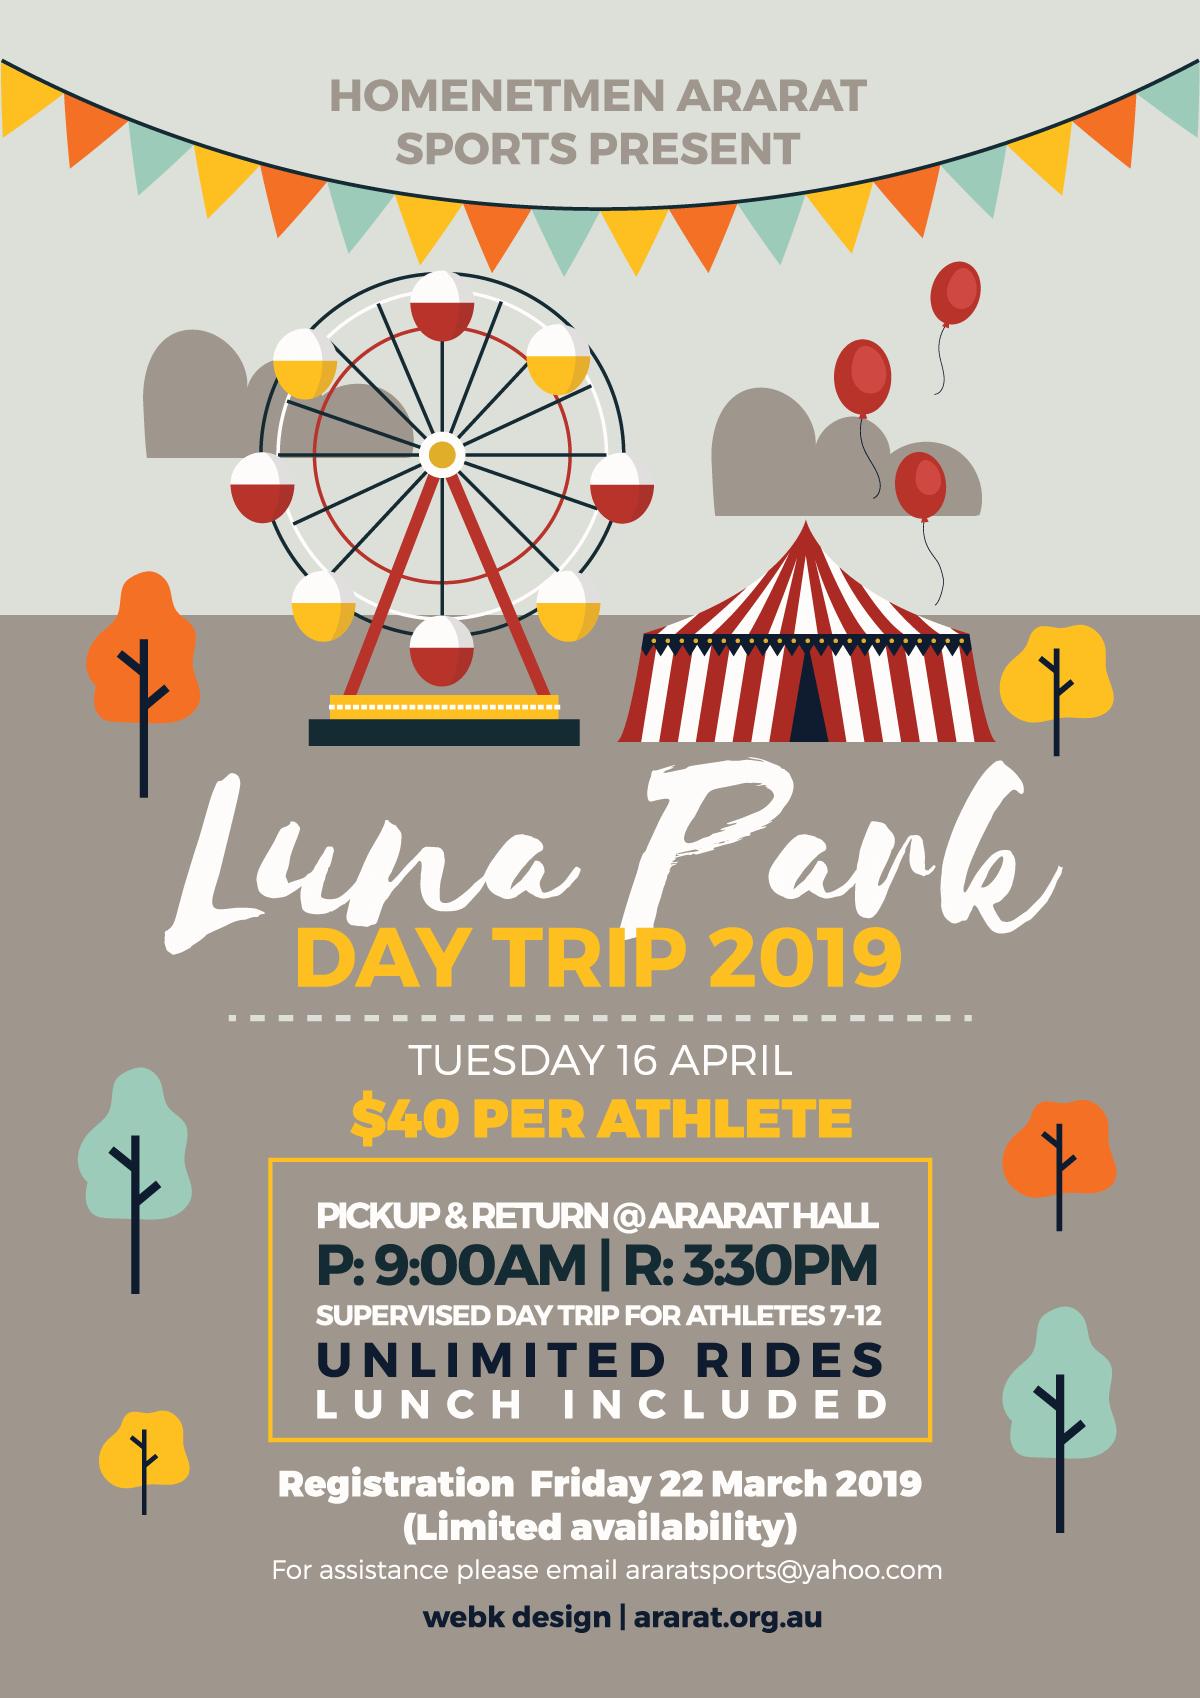 Ararat-Sports-Luna-Park-Trip-2019